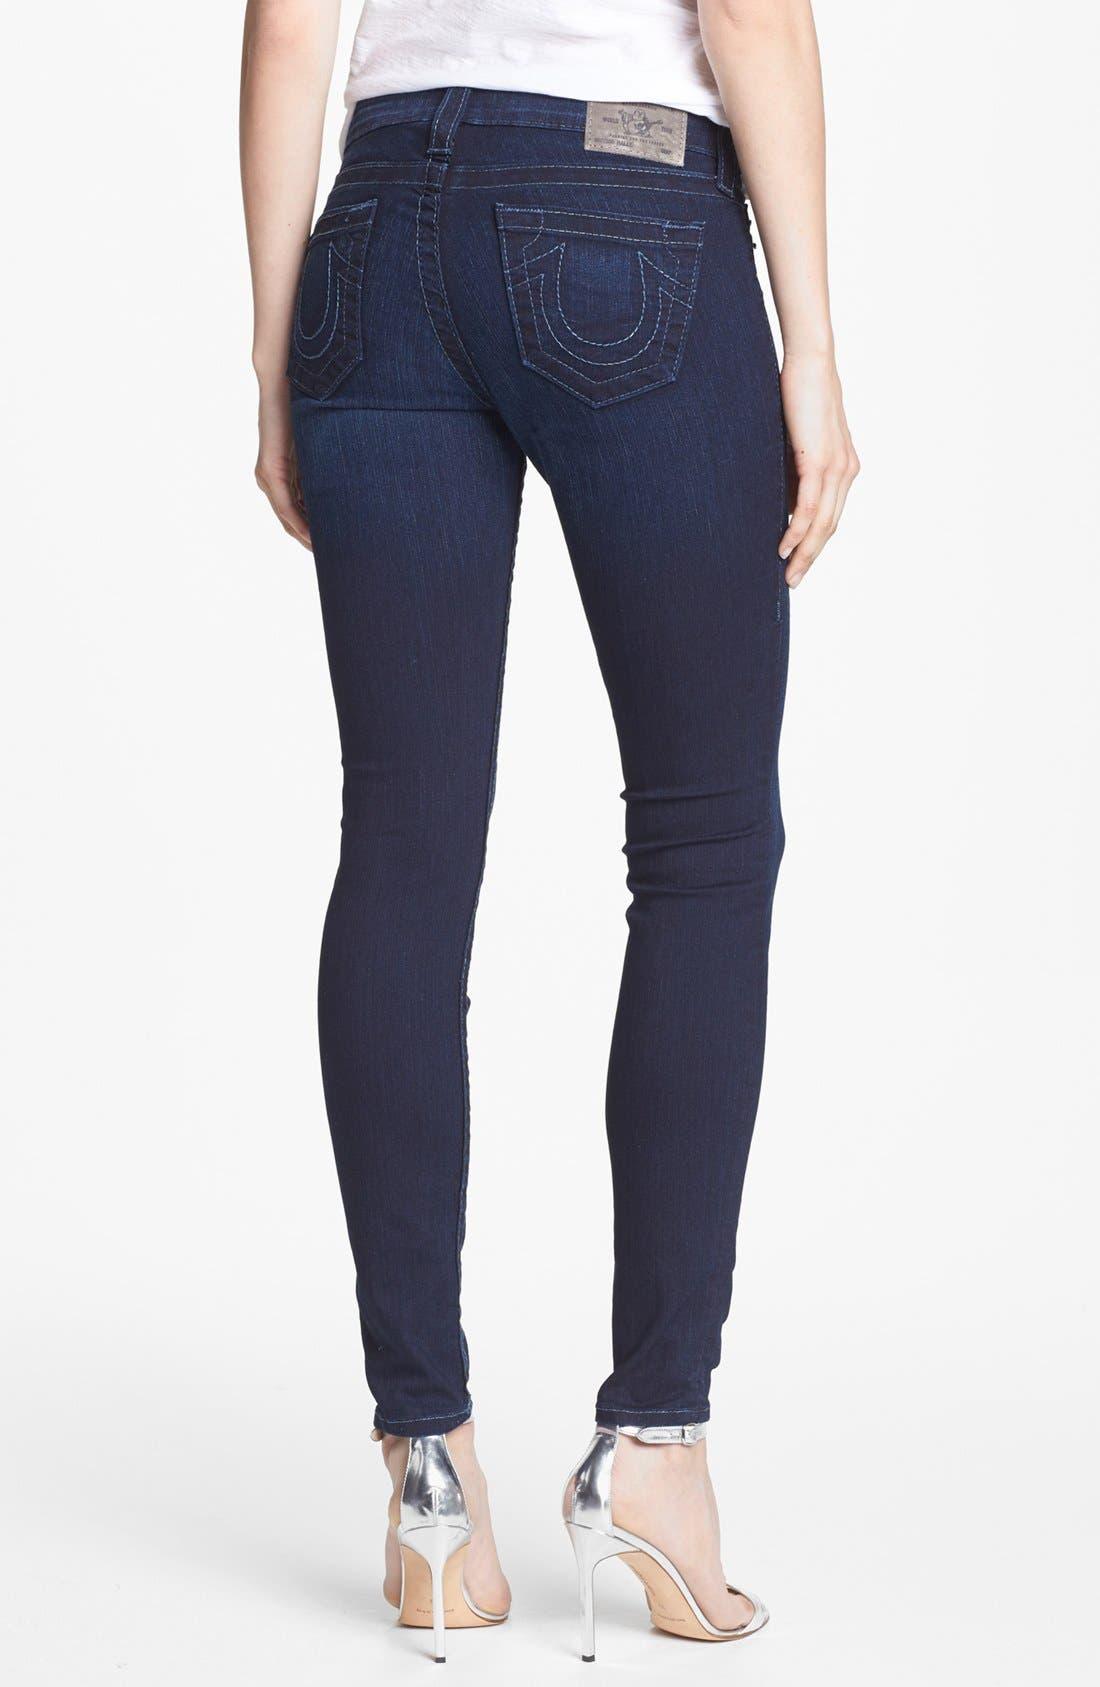 Alternate Image 2  - True Religion Brand Jeans 'Halle' Mid Rise Skinny Jeans (Starlight)